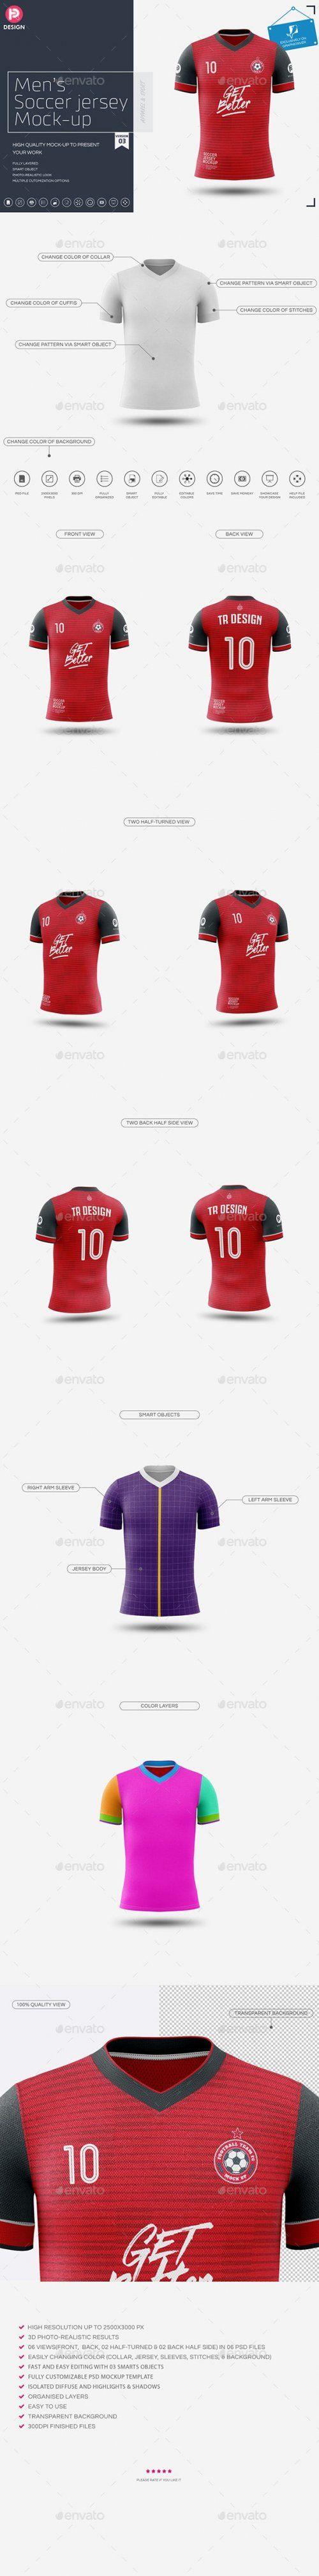 Download Graphicriver Men S Soccer Jersey Mockup V3 24206939 Soccer Jersey Soccer Mockup